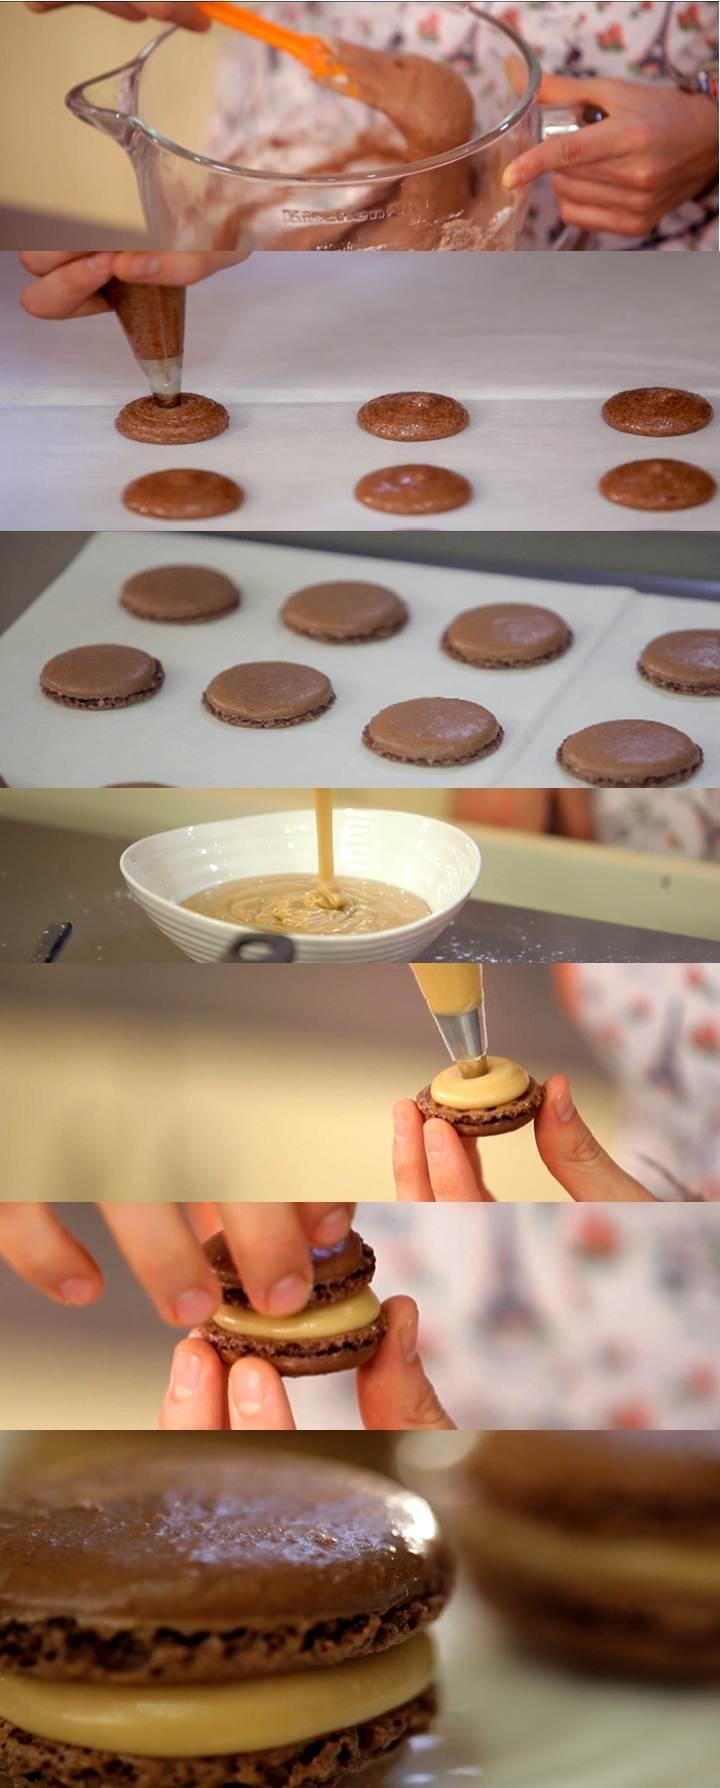 Cupcake Maniacs 11: Macarons de chocolate